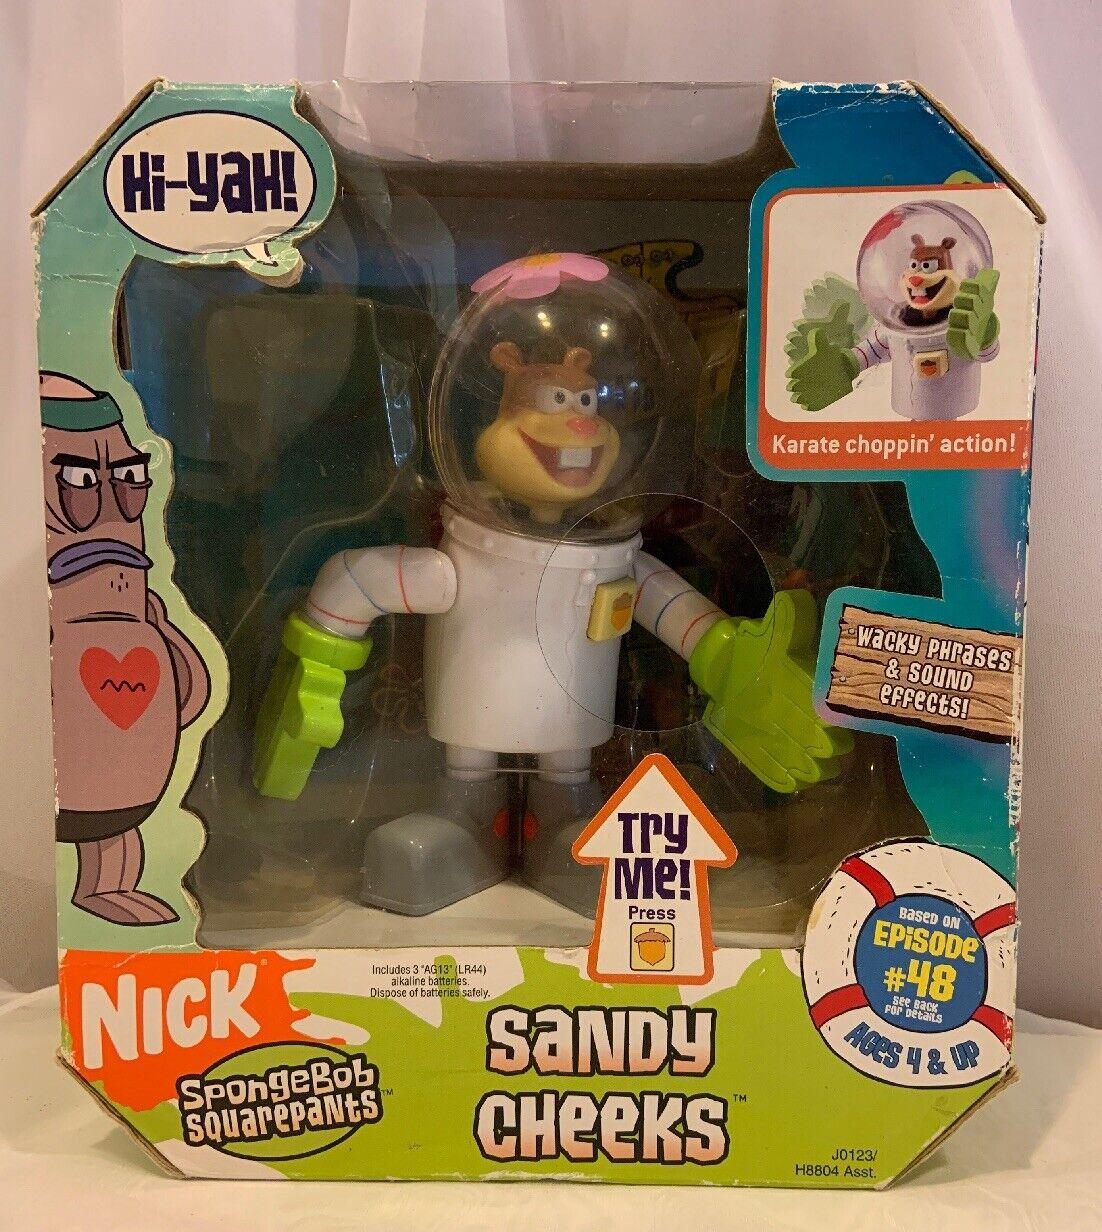 Nick Spongebob SquareHose Sandy Cheeks Karate Action Figure New In Box